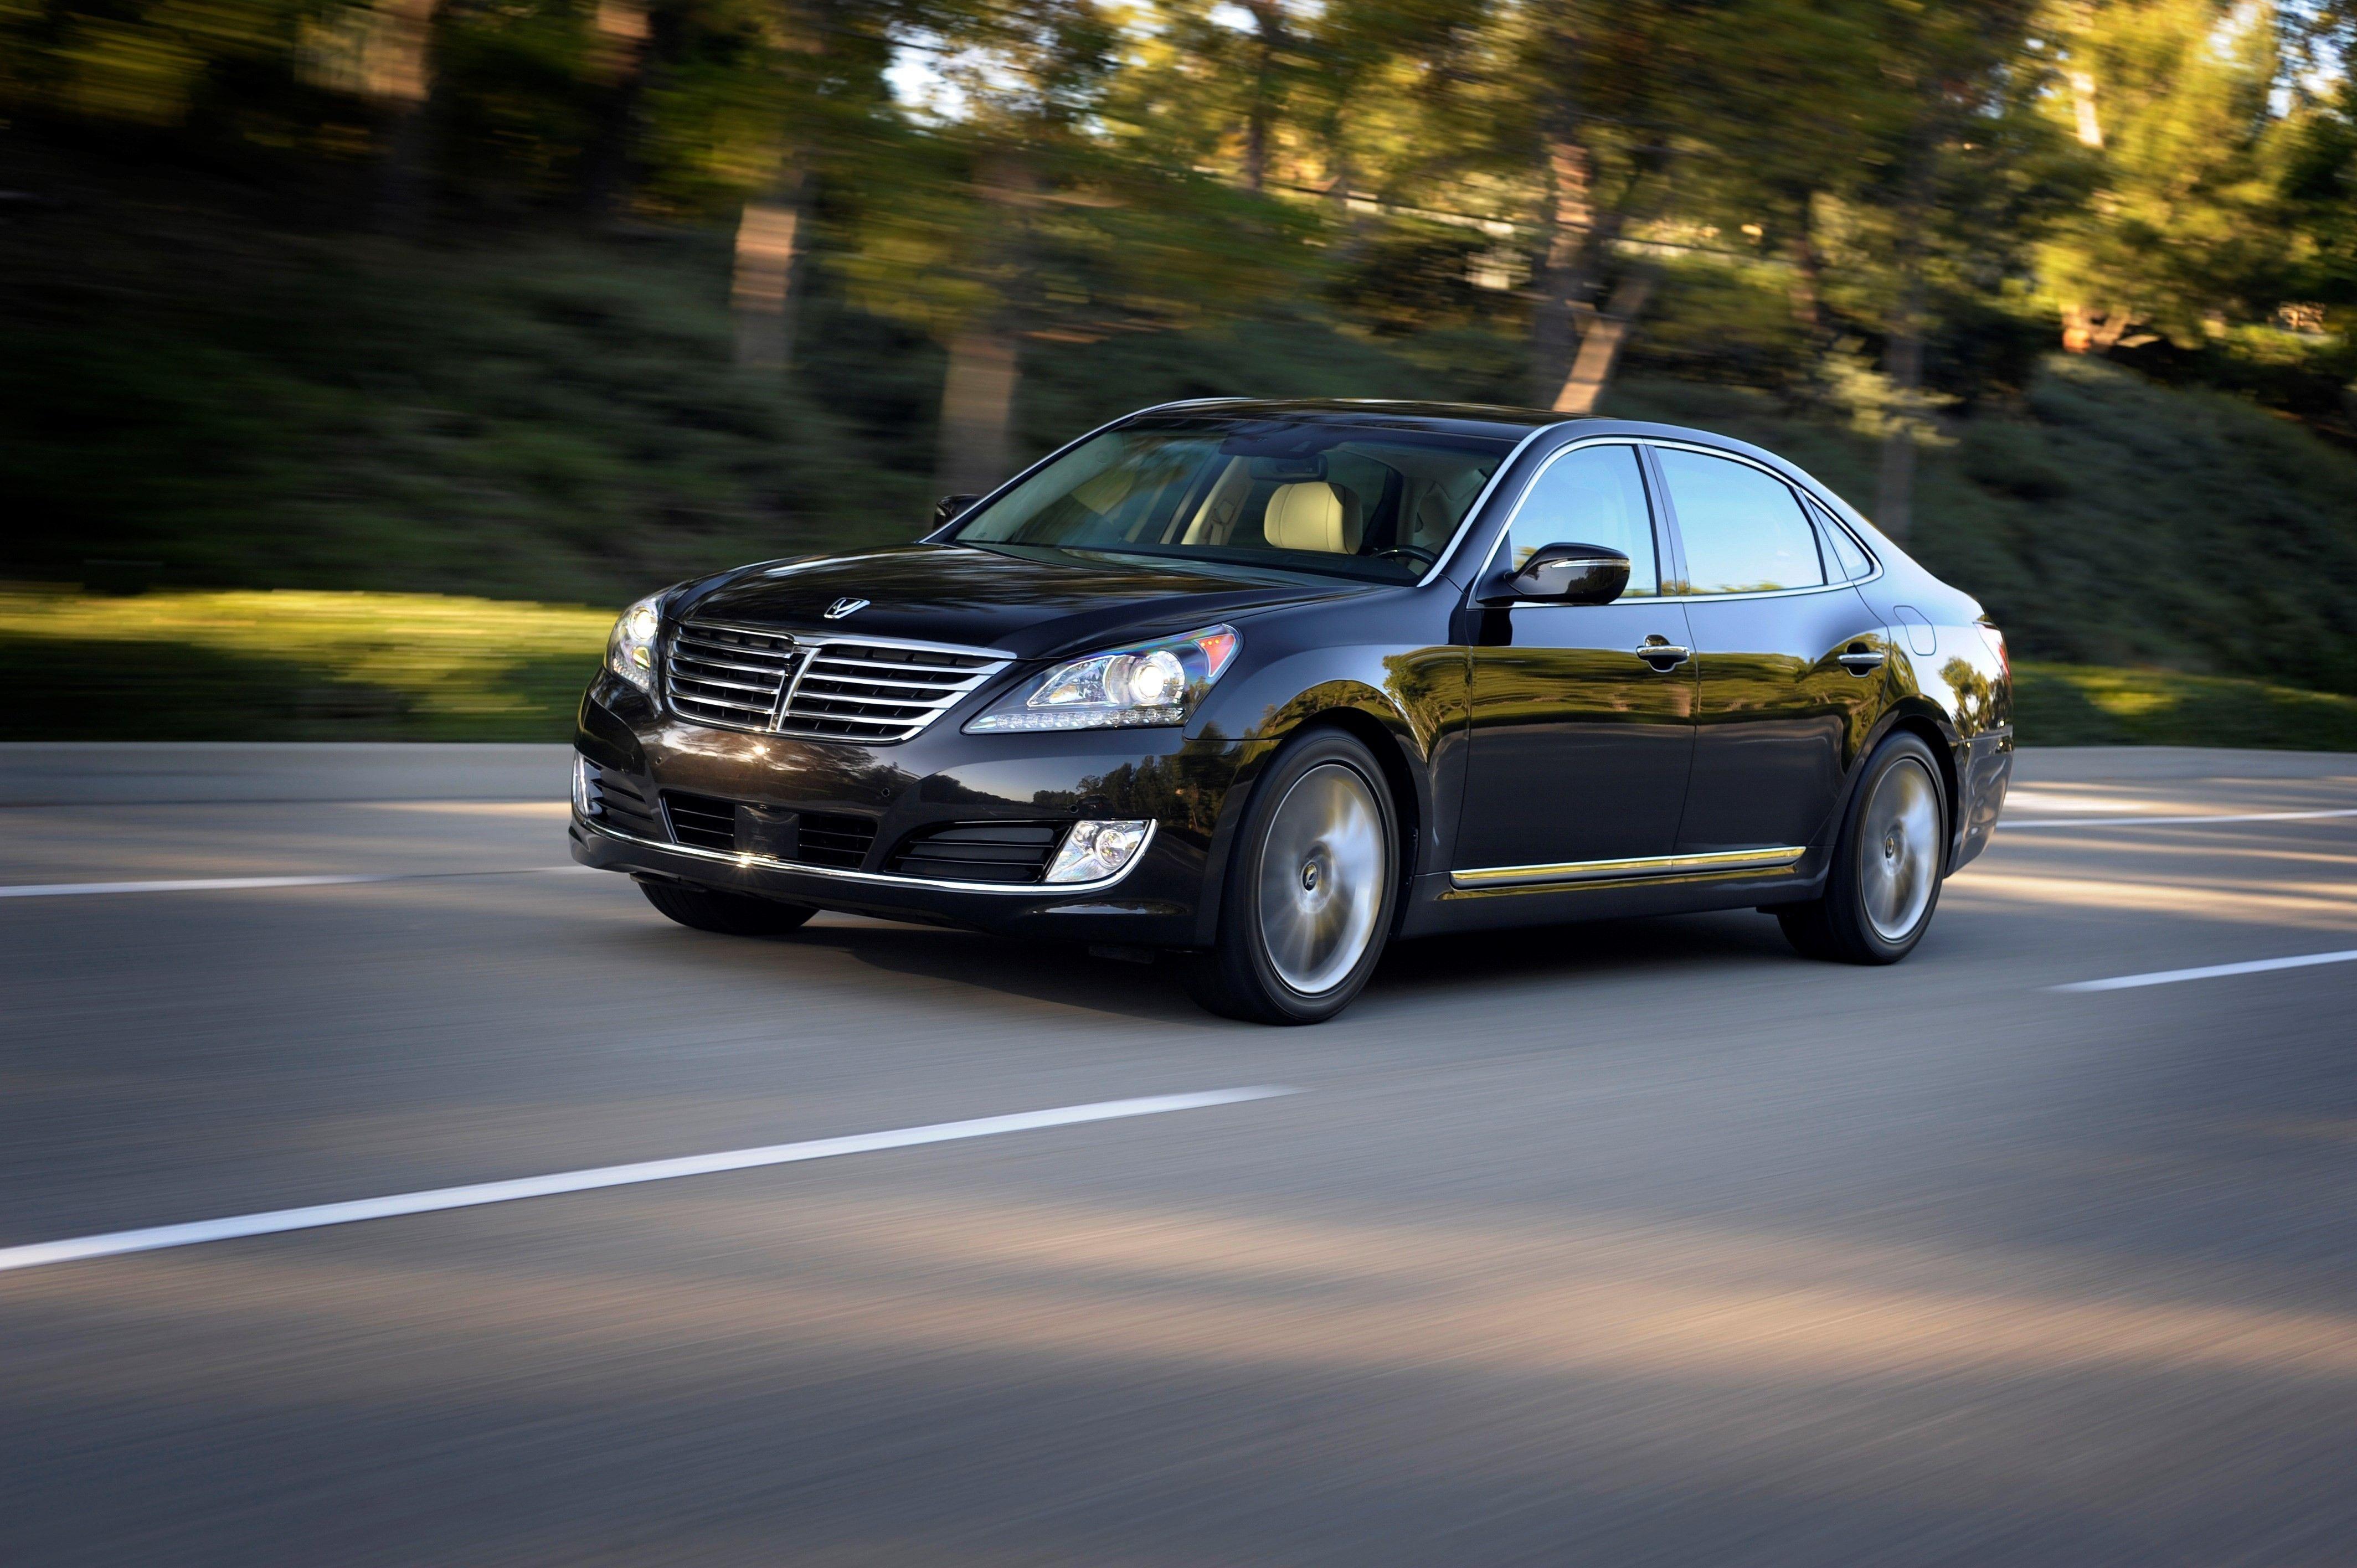 Hyundai Equus Review, Pricing and Specs